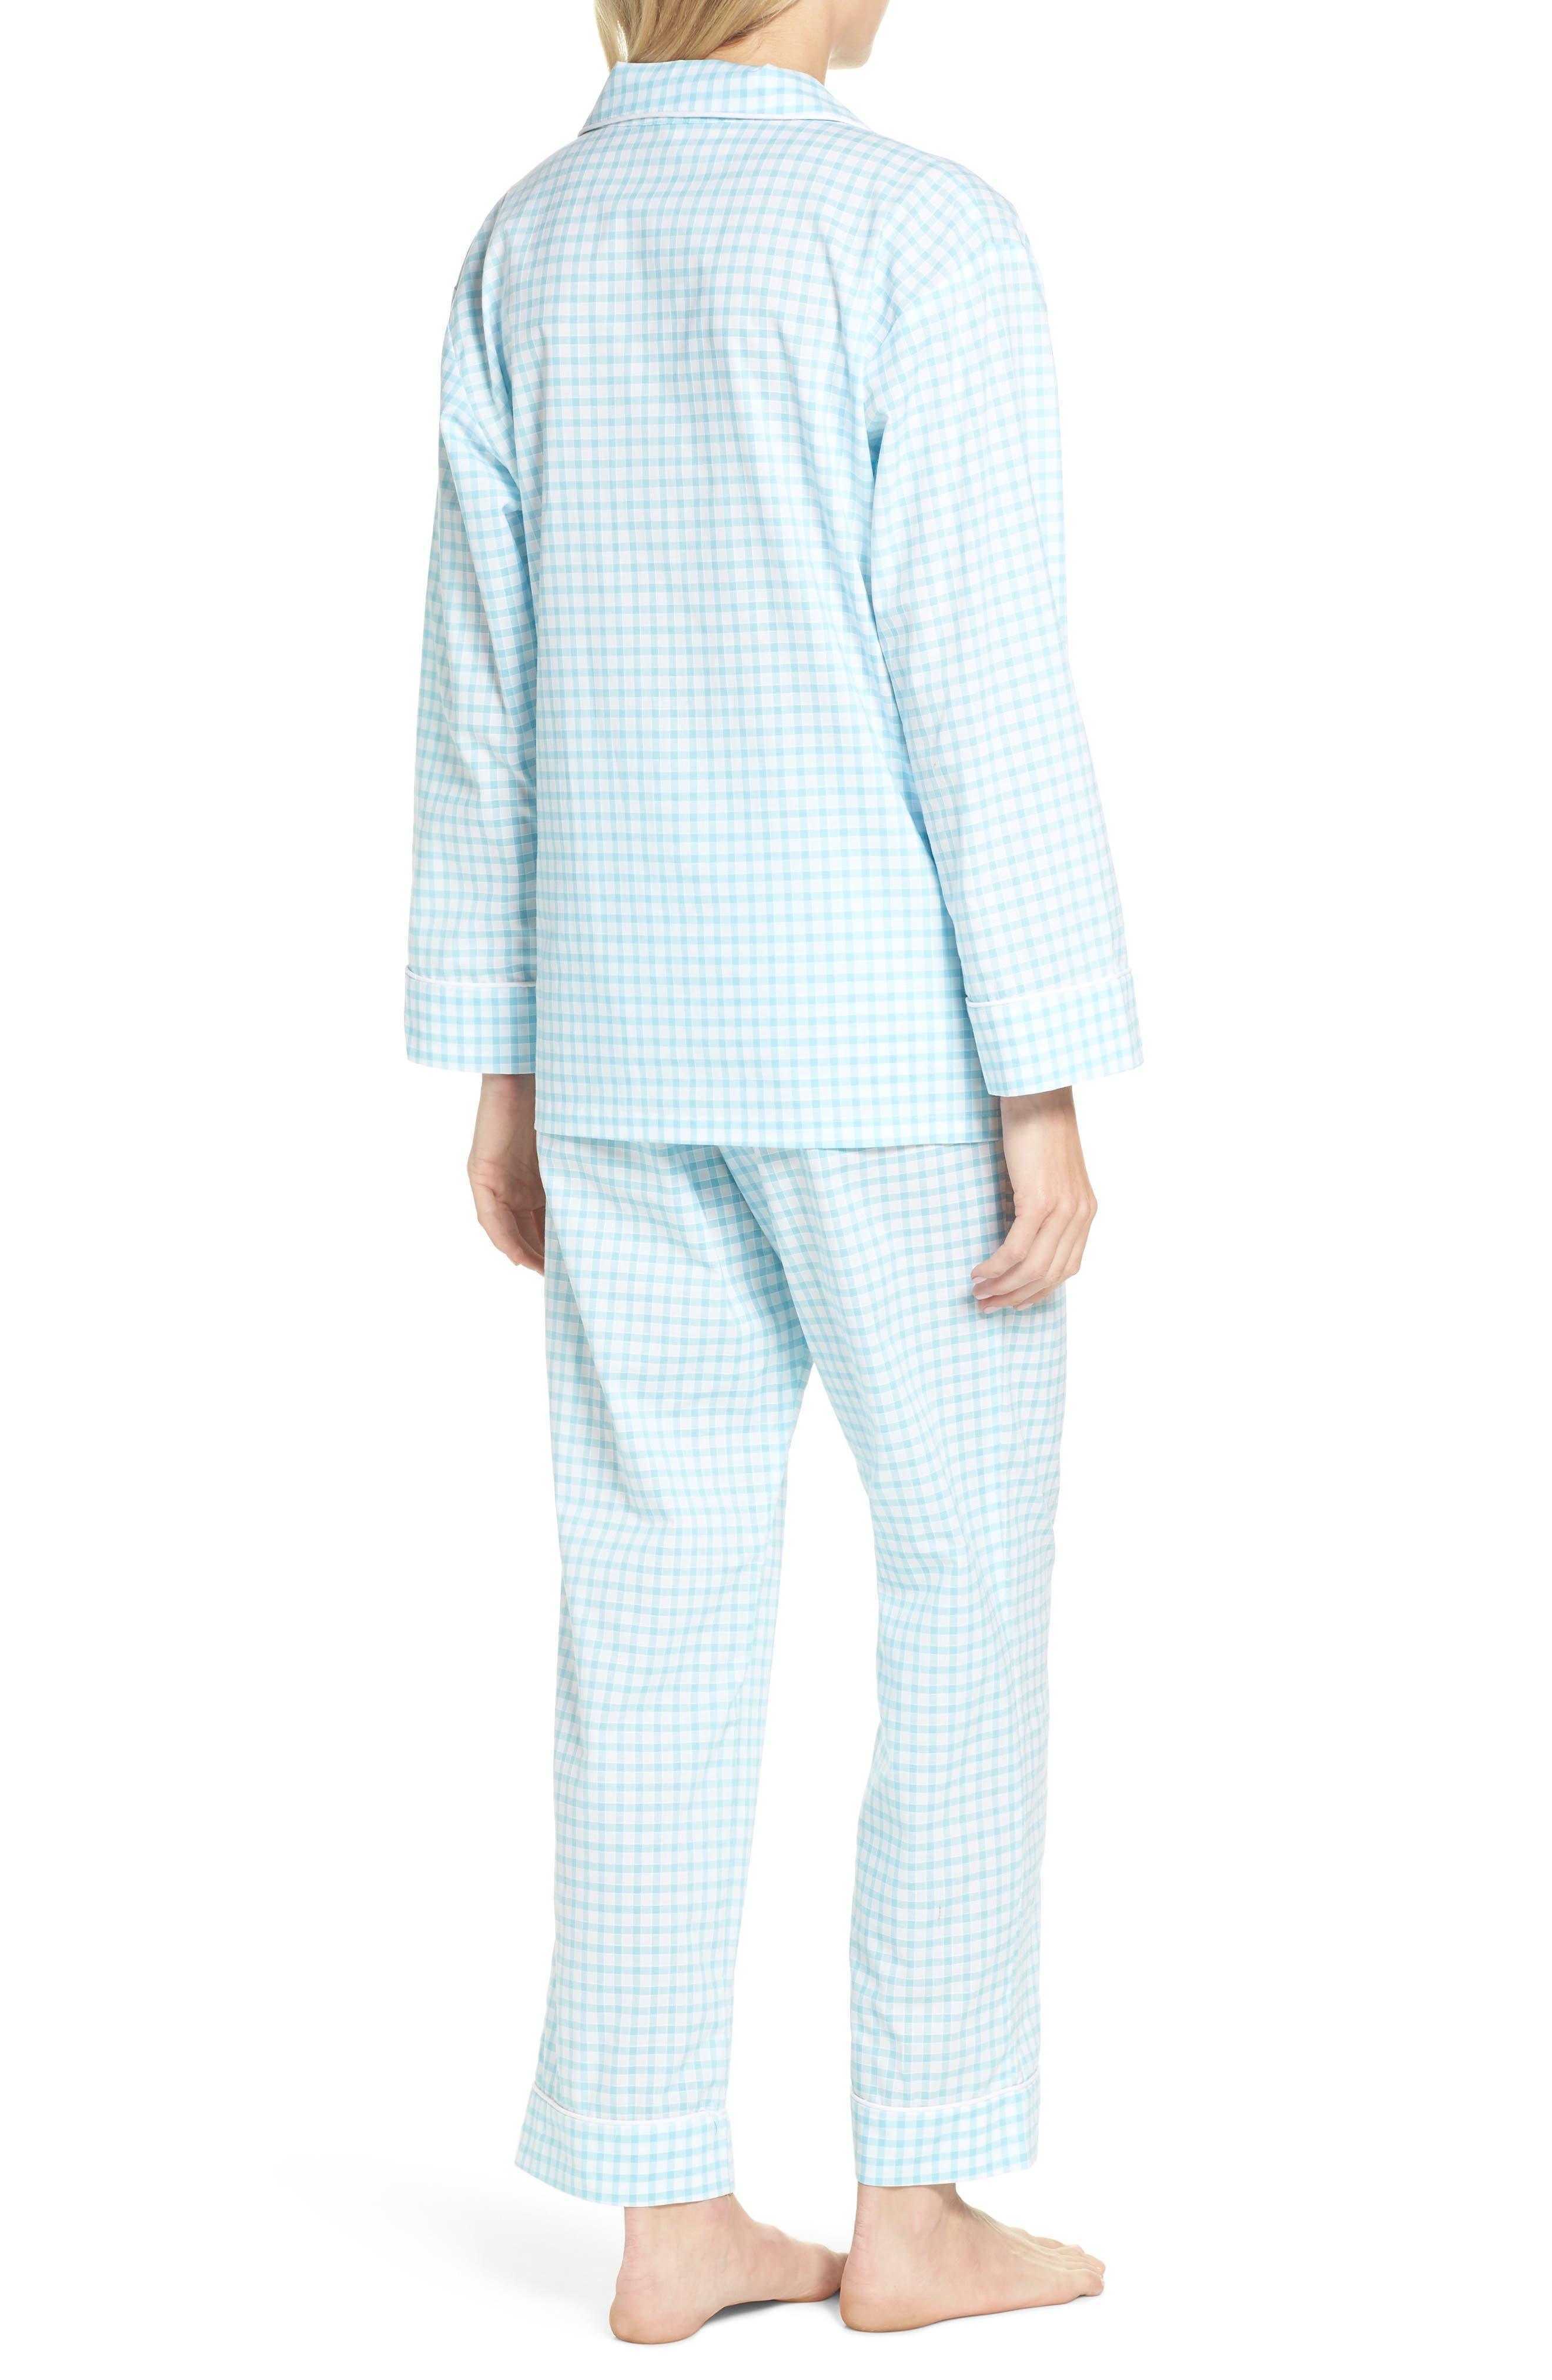 Gingham Pajamas,                             Alternate thumbnail 2, color,                             439